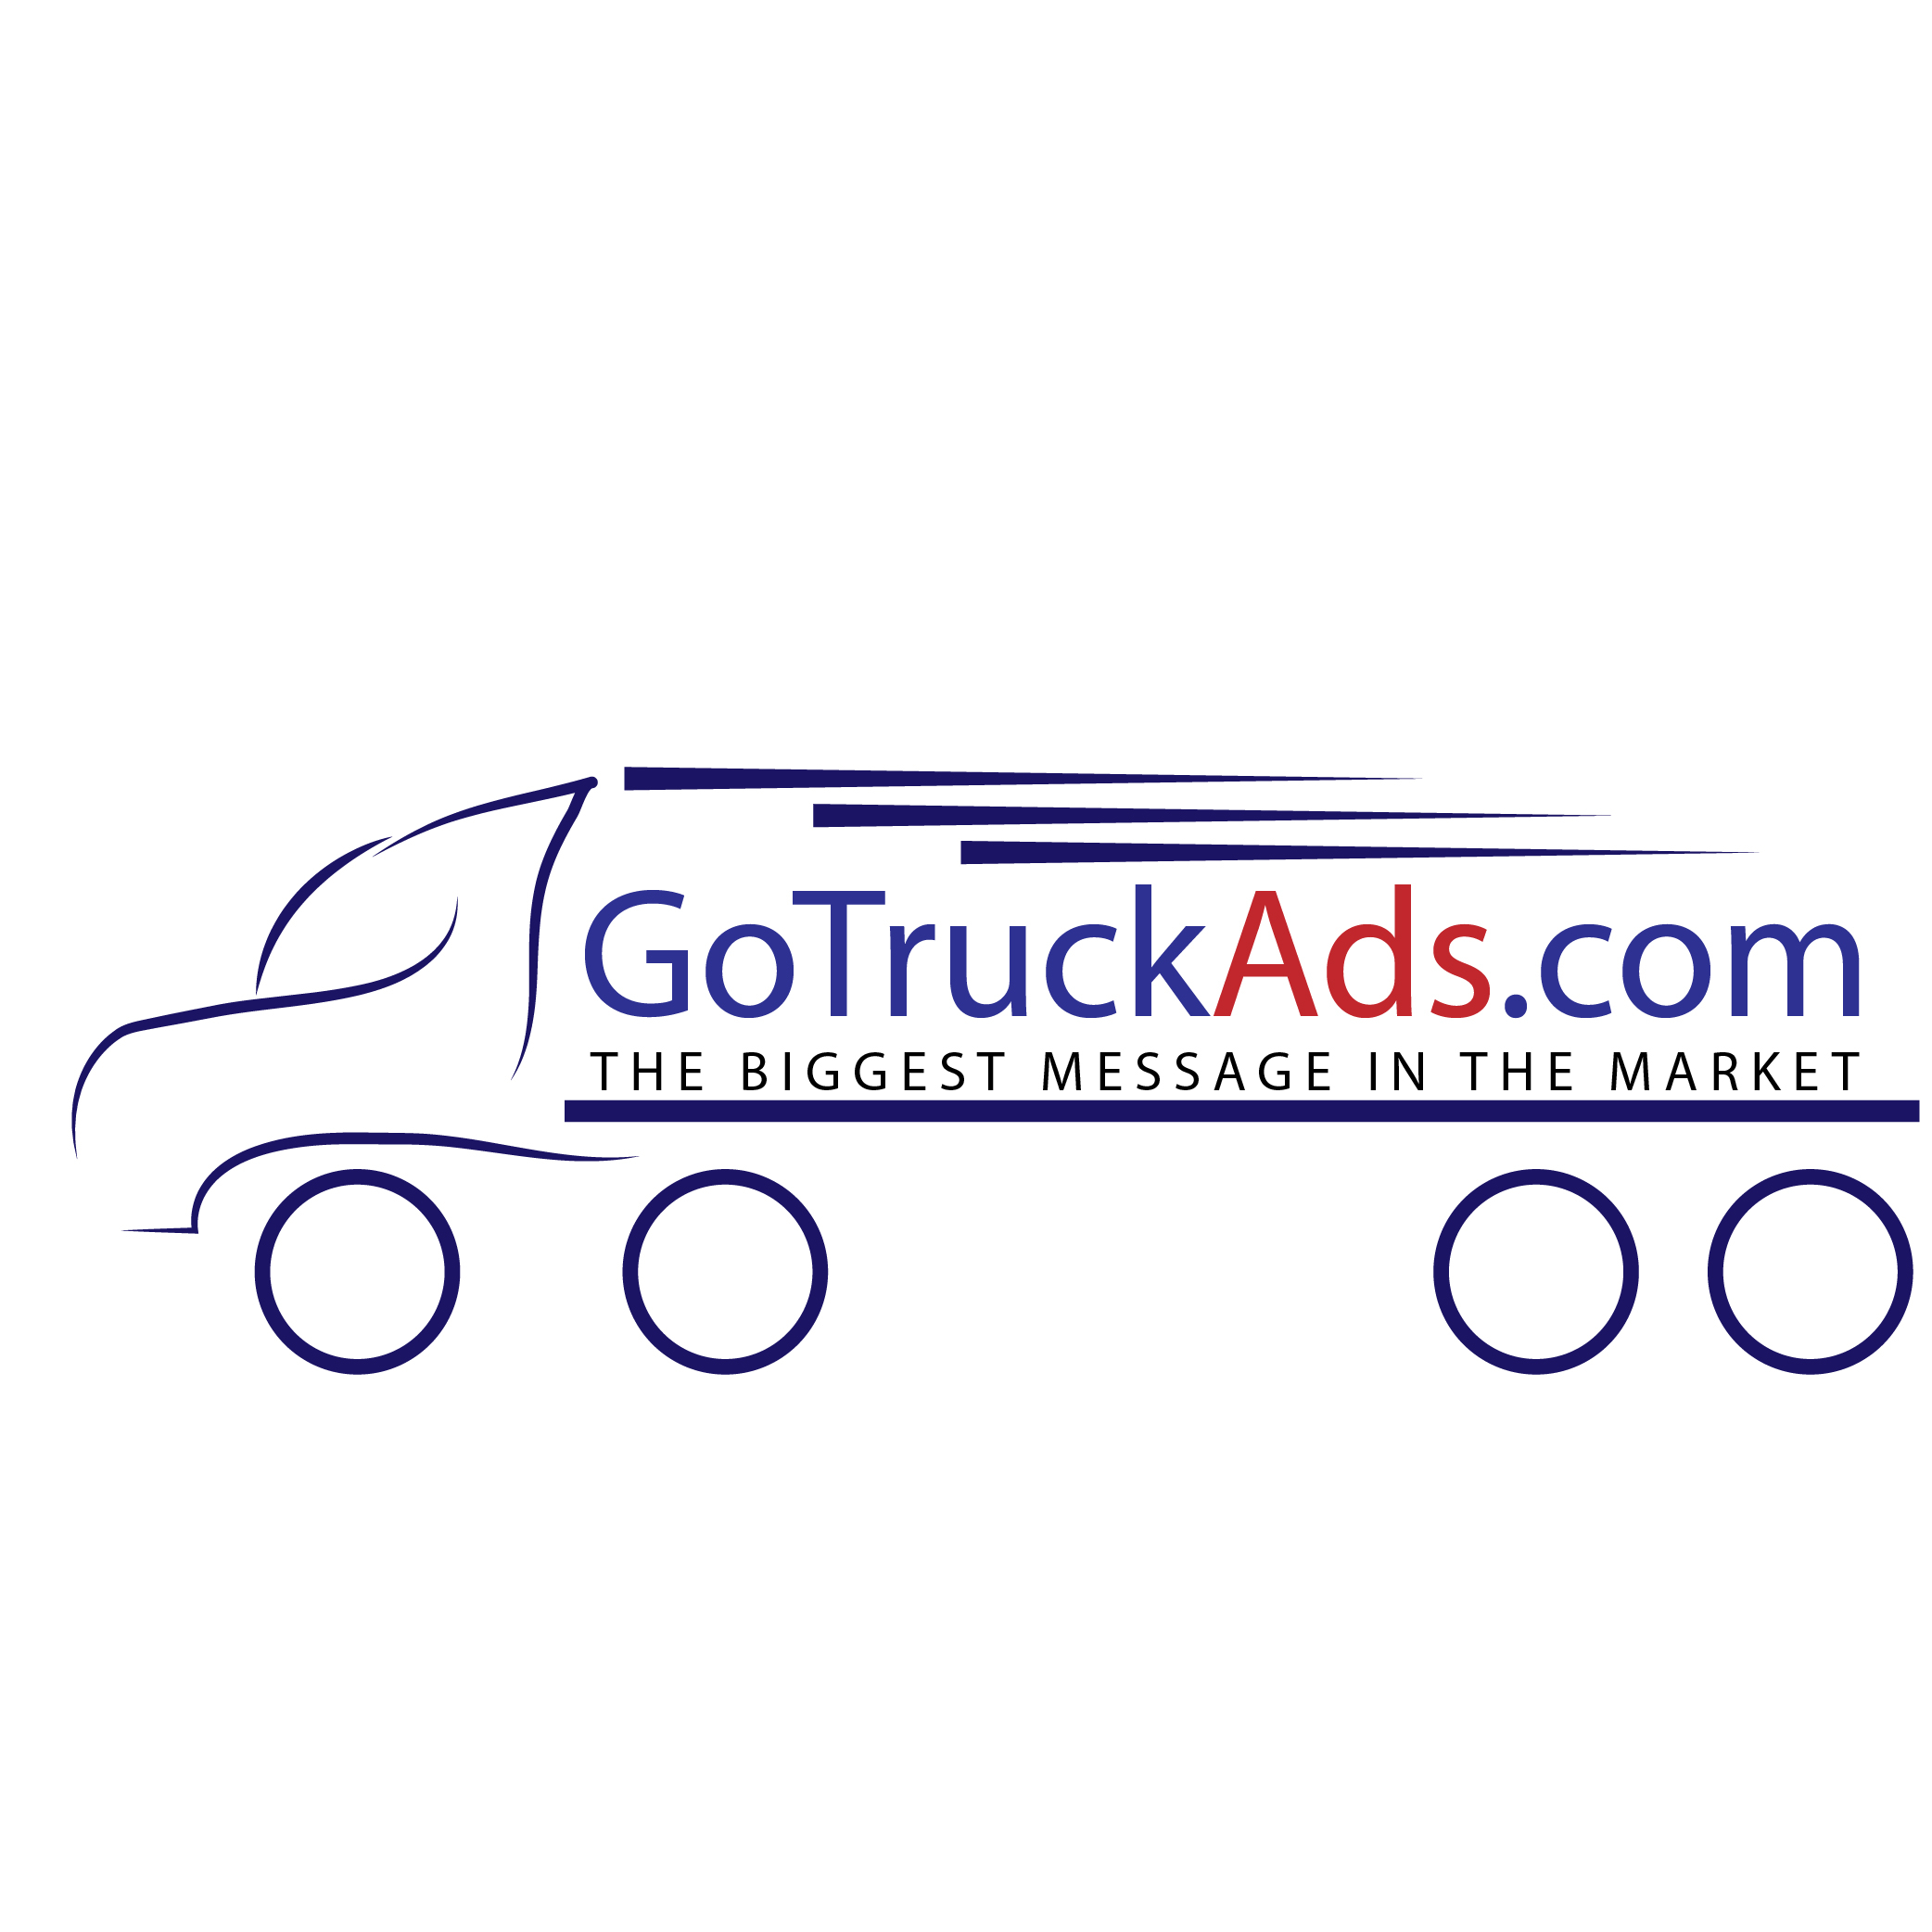 GoTruckAds.com